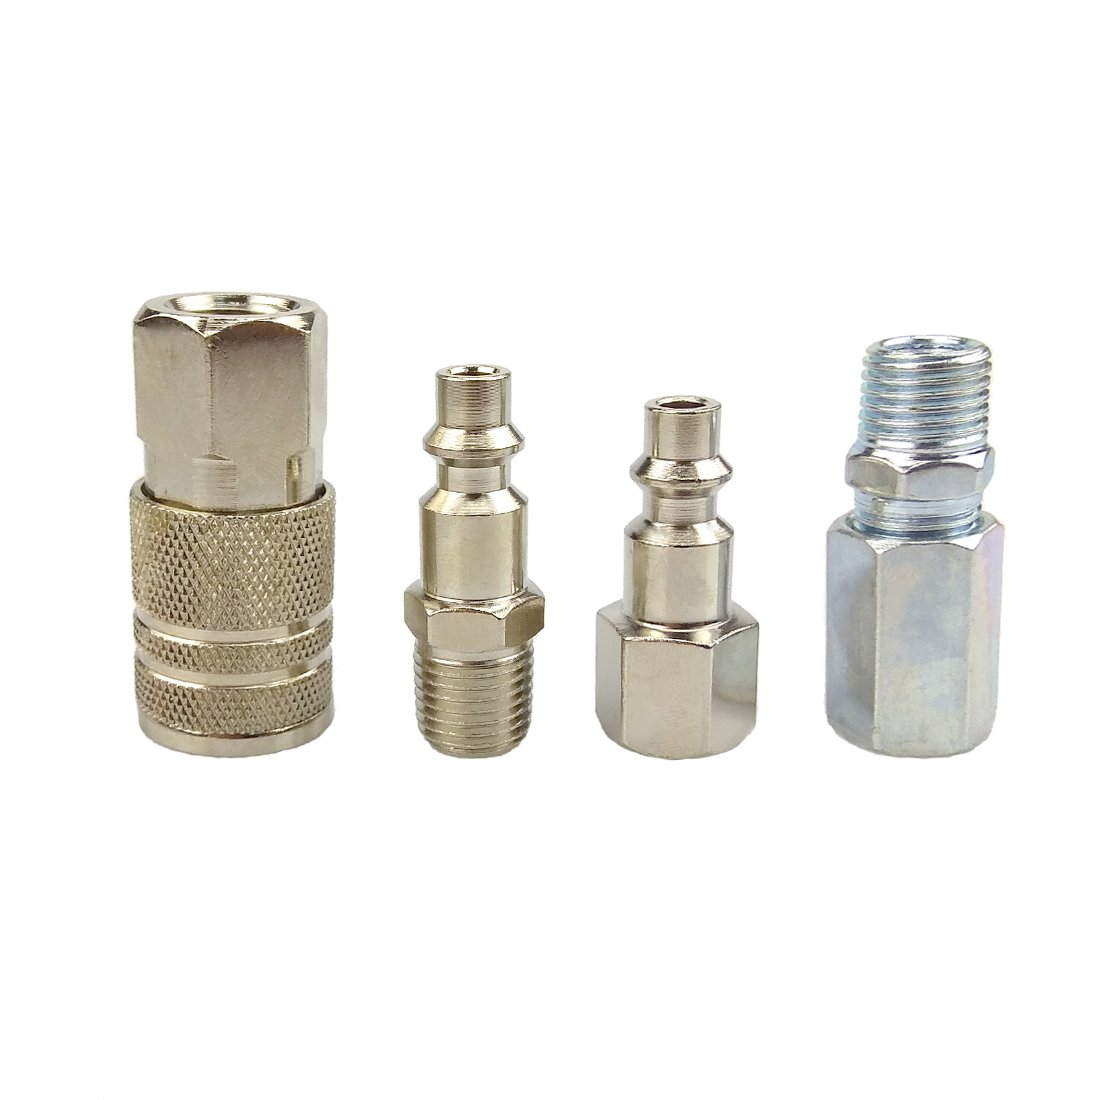 20 Piece/ 20 Piece/ 1//4 NPT Air Tool Kit w//1//4x25Ft Coil Nylon Hose//Blow Gun//Tire Gauge 1//4 NPT Air Tool Kit w//1//4x25Ft Coil Nylon Hose//Blow Gun//Tire Gauge Tuhoomall Air Compressor Accessory Kit